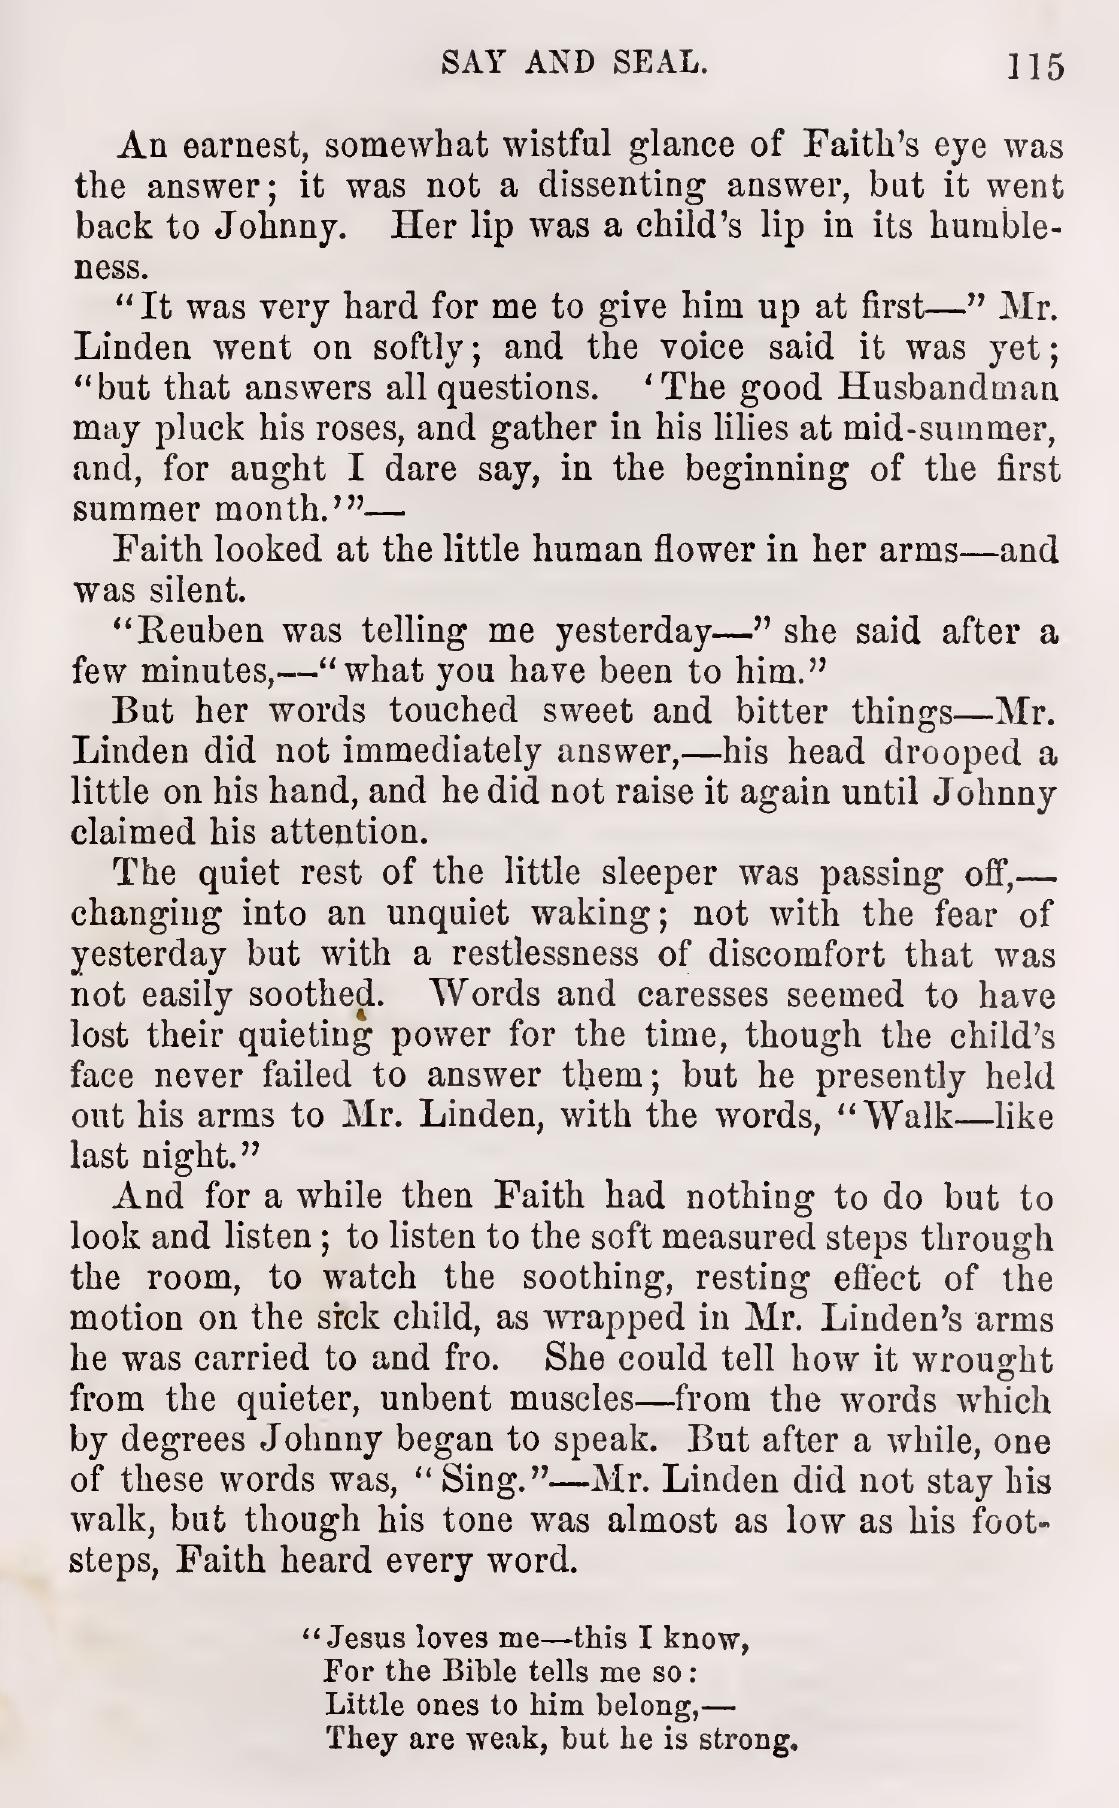 Warner-SaySeal-1860-vol2-121.jpg